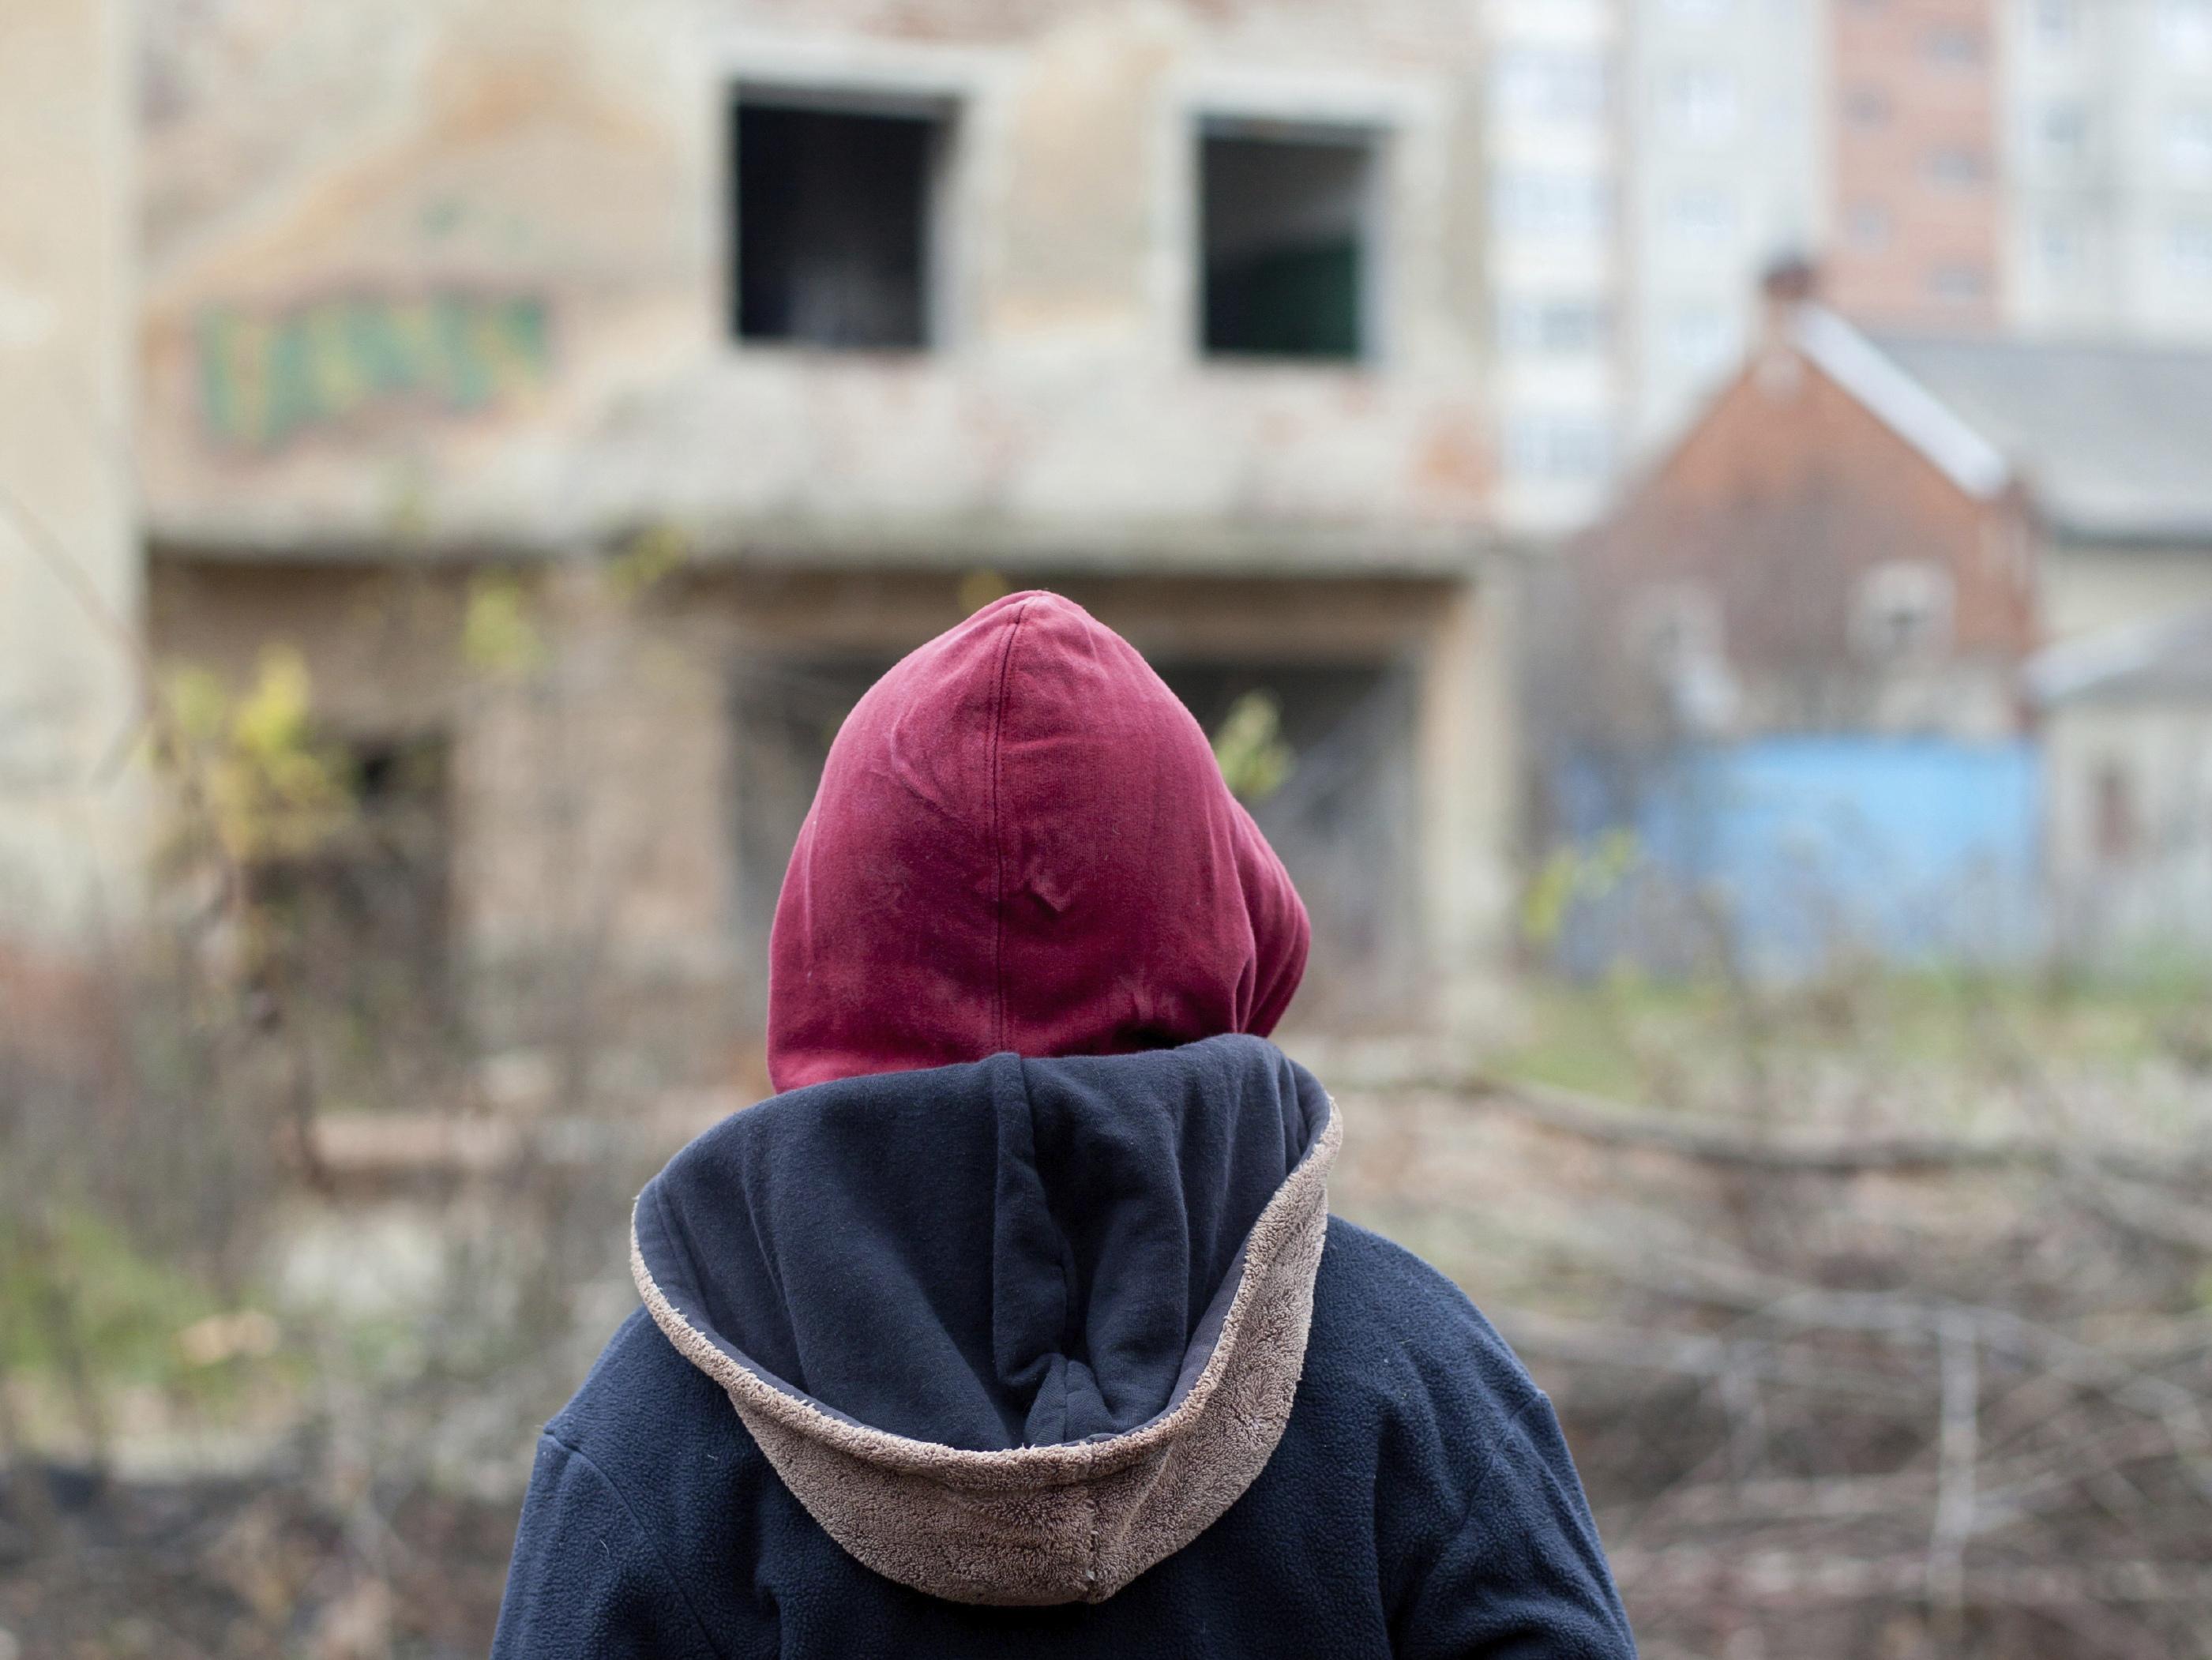 Tackling neighborhood inequality requires durable urban policies